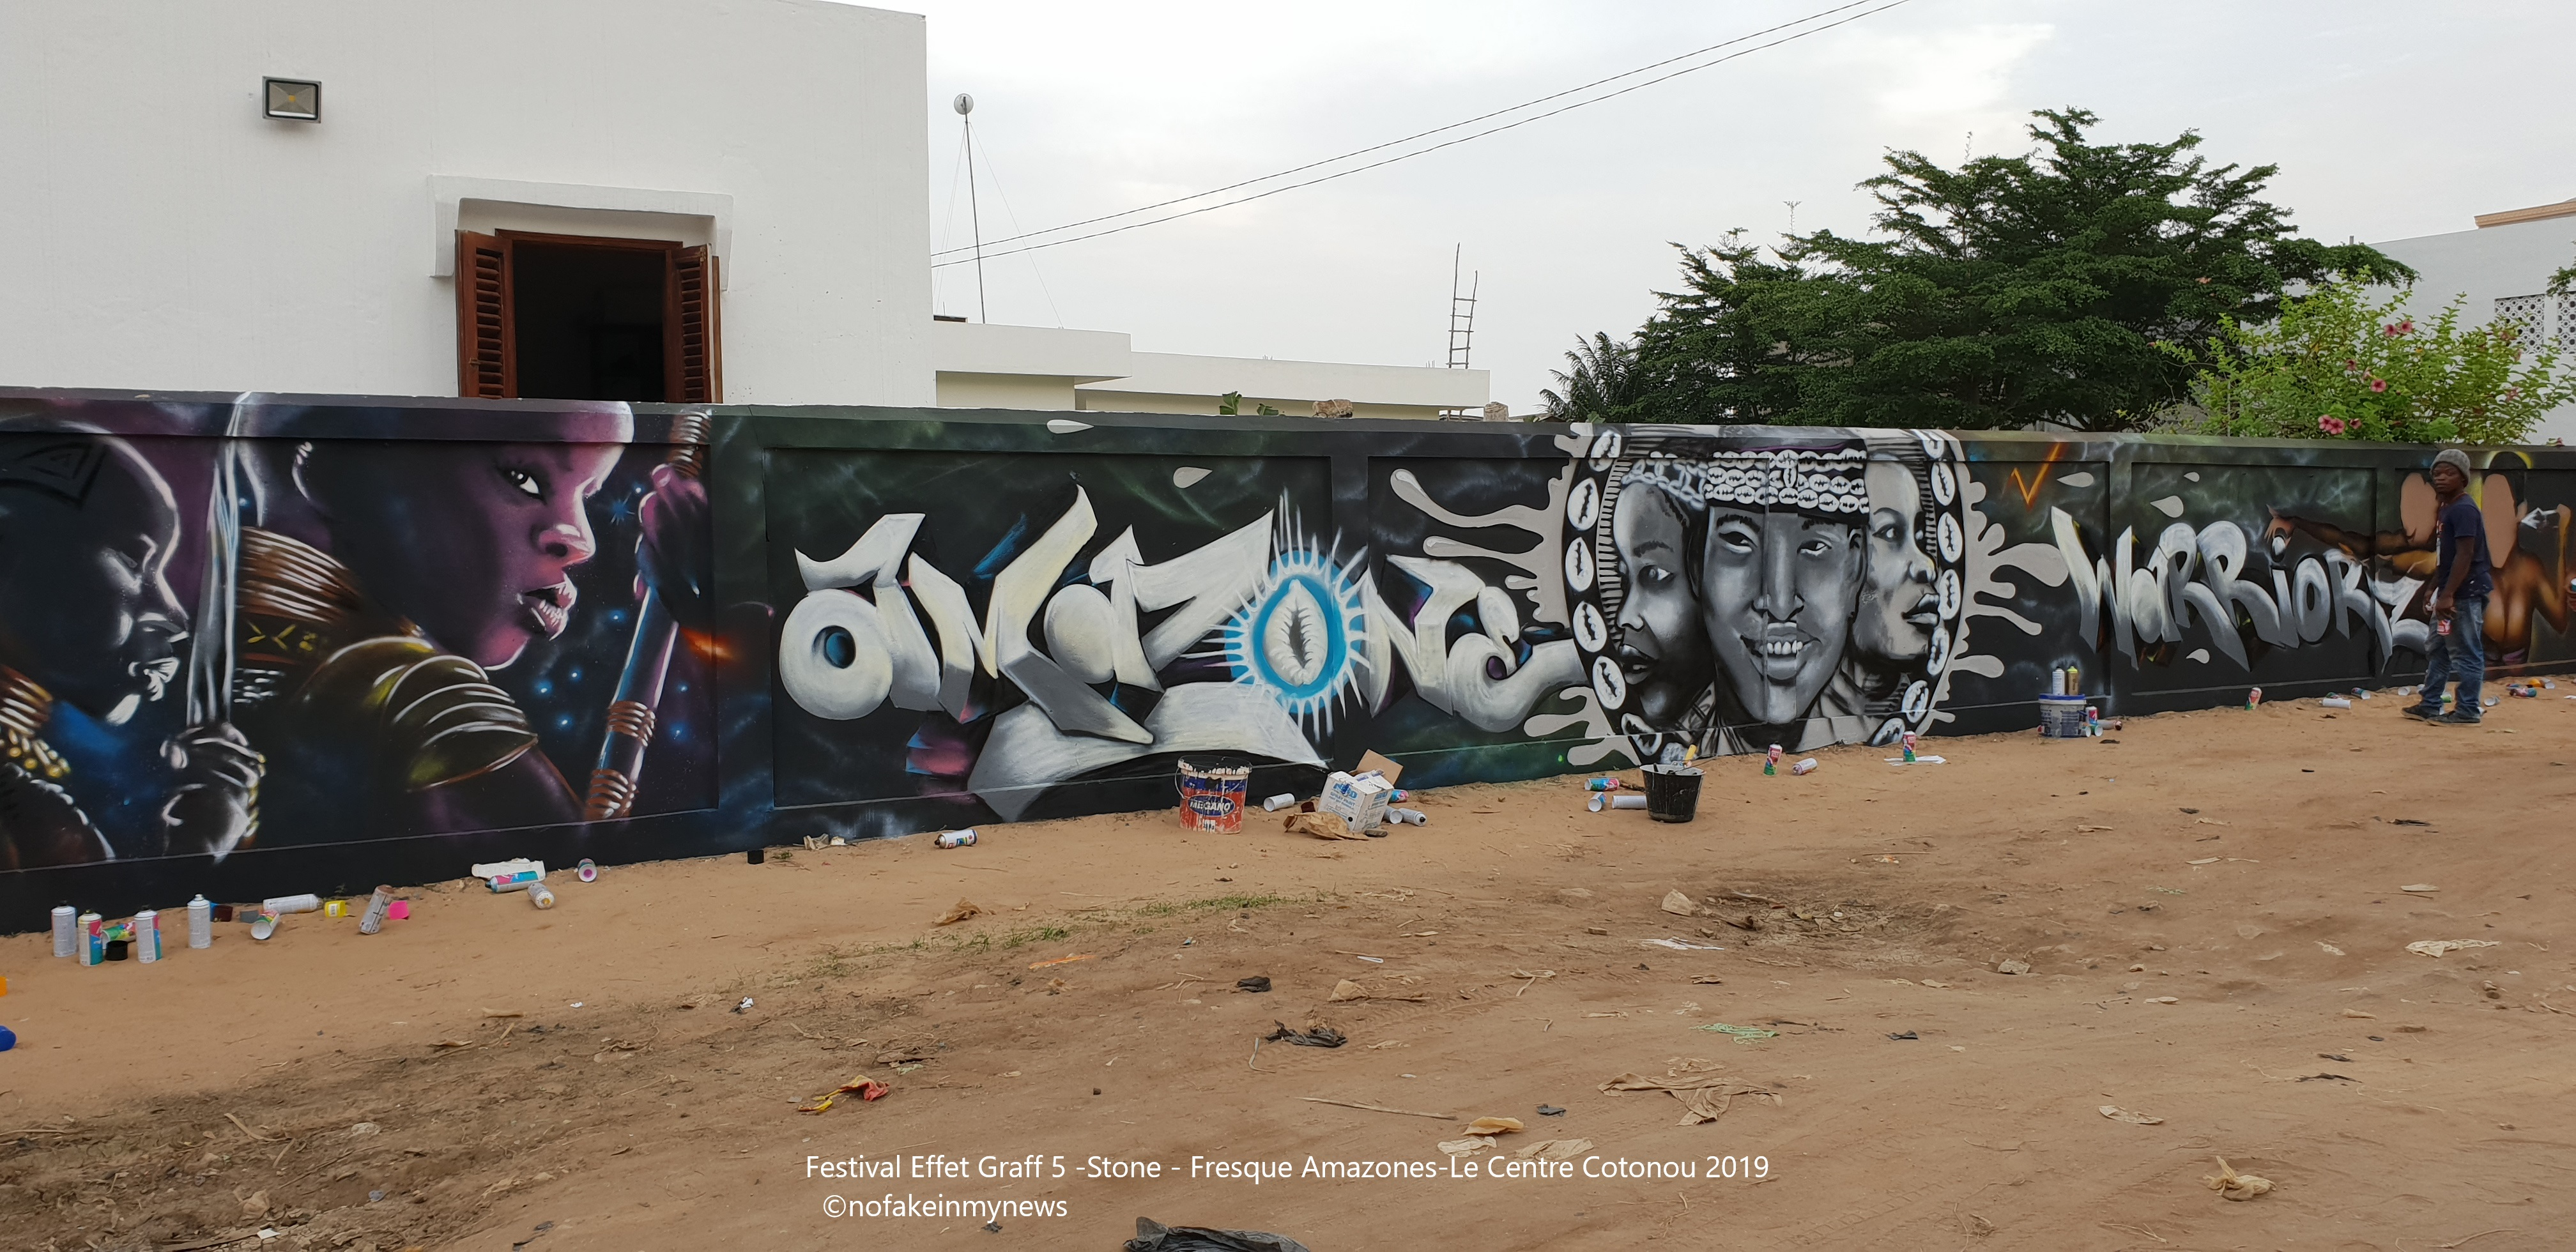 Festival Effet Graff 5 -Stone -Le Centre Cotonou 2019 - ©nofakeinmynews